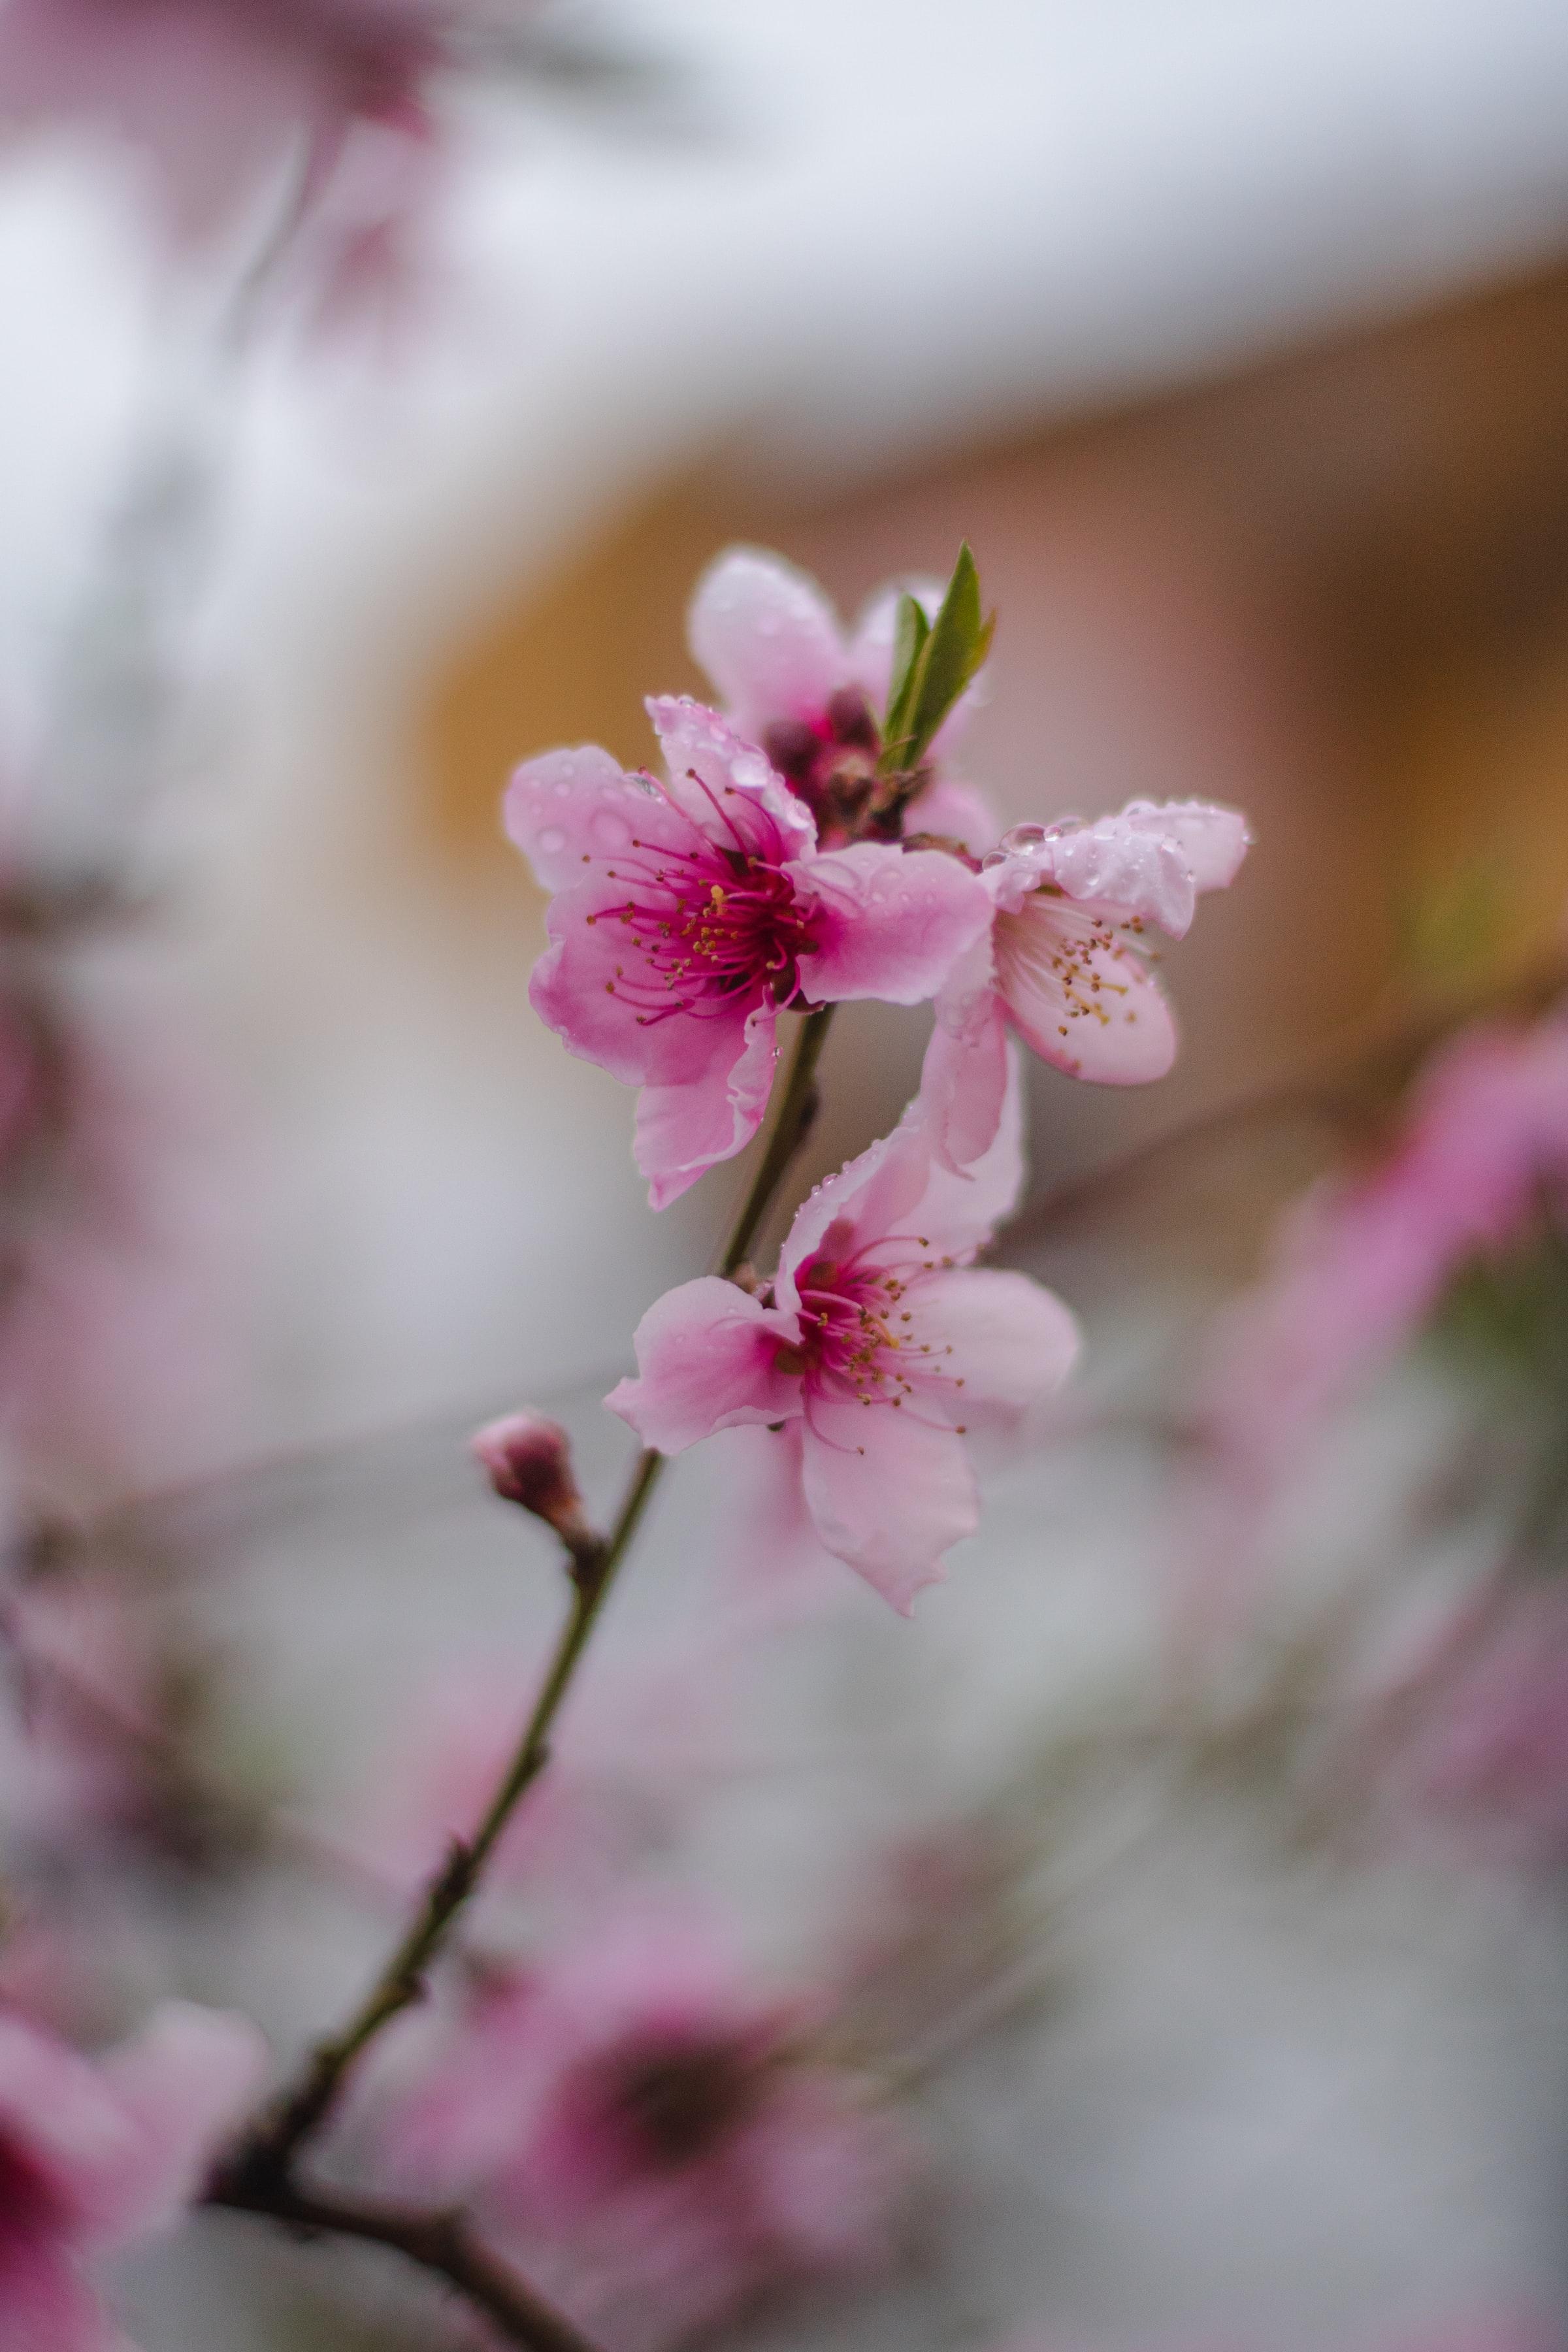 122641 Screensavers and Wallpapers Sakura for phone. Download Flowers, Sakura, Flower, Bloom, Flowering, Branch, Focus pictures for free